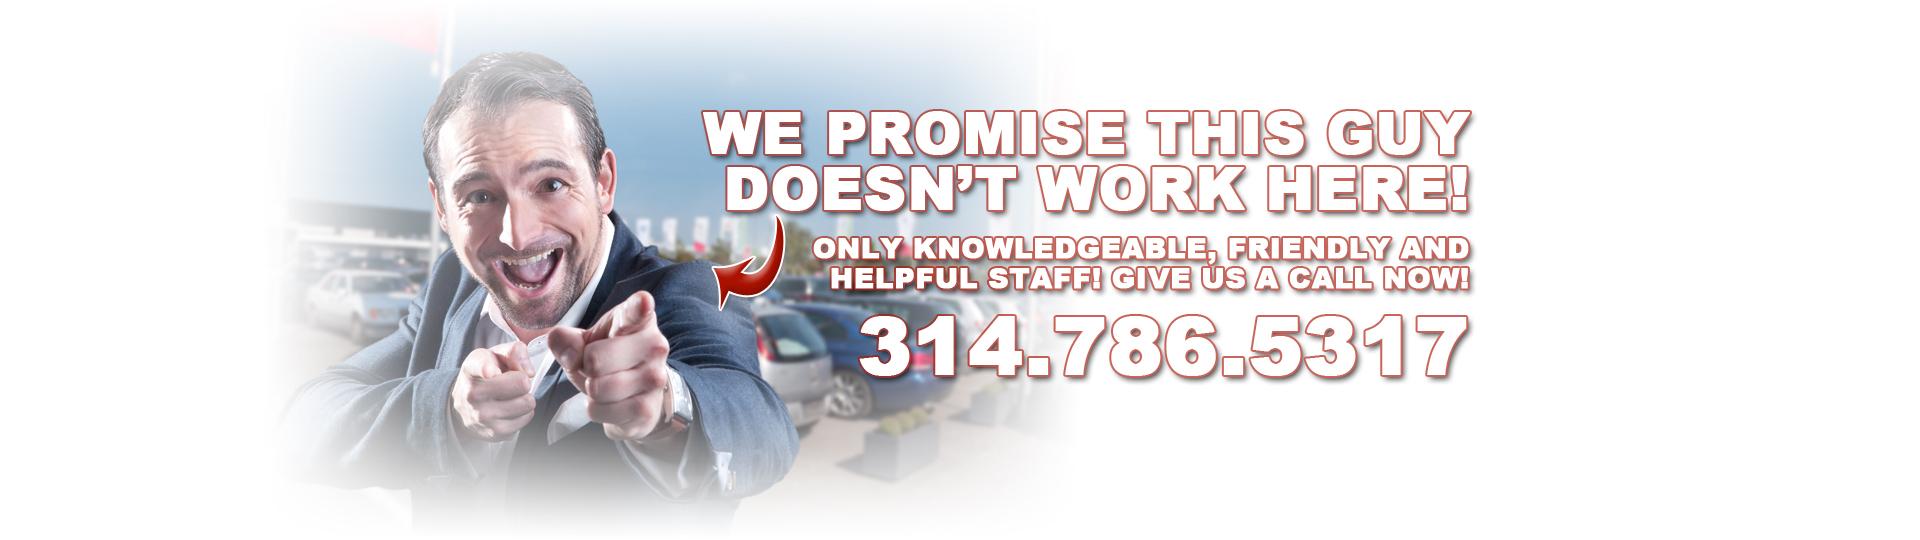 https://x-assets.autorevo-powersites.com/content/assets/clients/2215de71-f467-425e-b70e-351248ec9e4f/6-cheesy-used-car-salesman